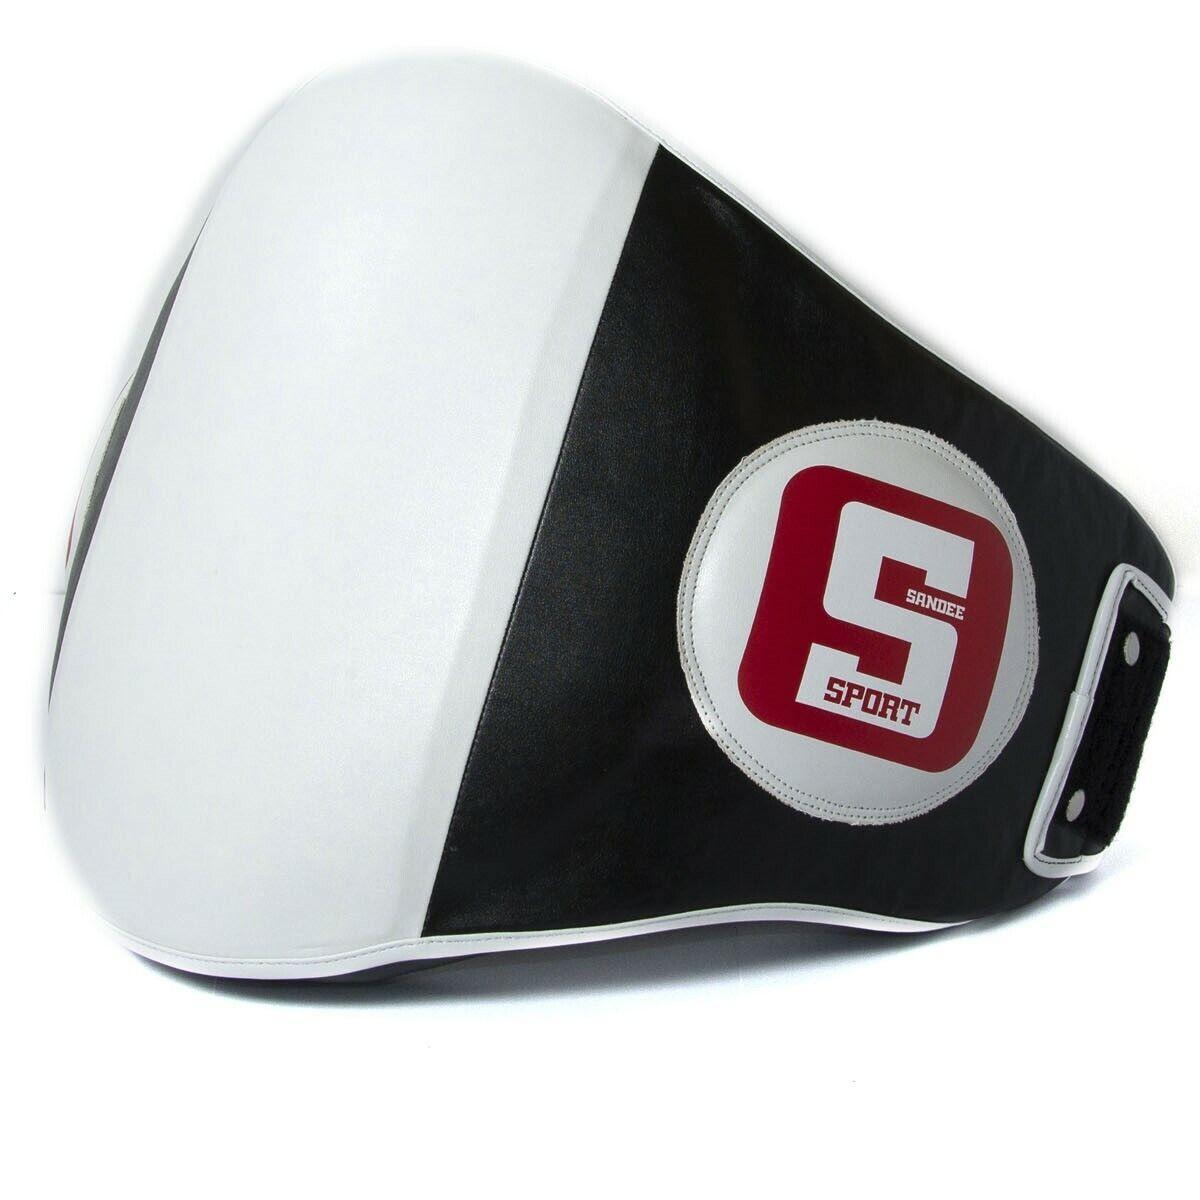 Seee Sport pelle Sintetica Pancia Panno Bianco Nero Colpire Thai scatolae Calci